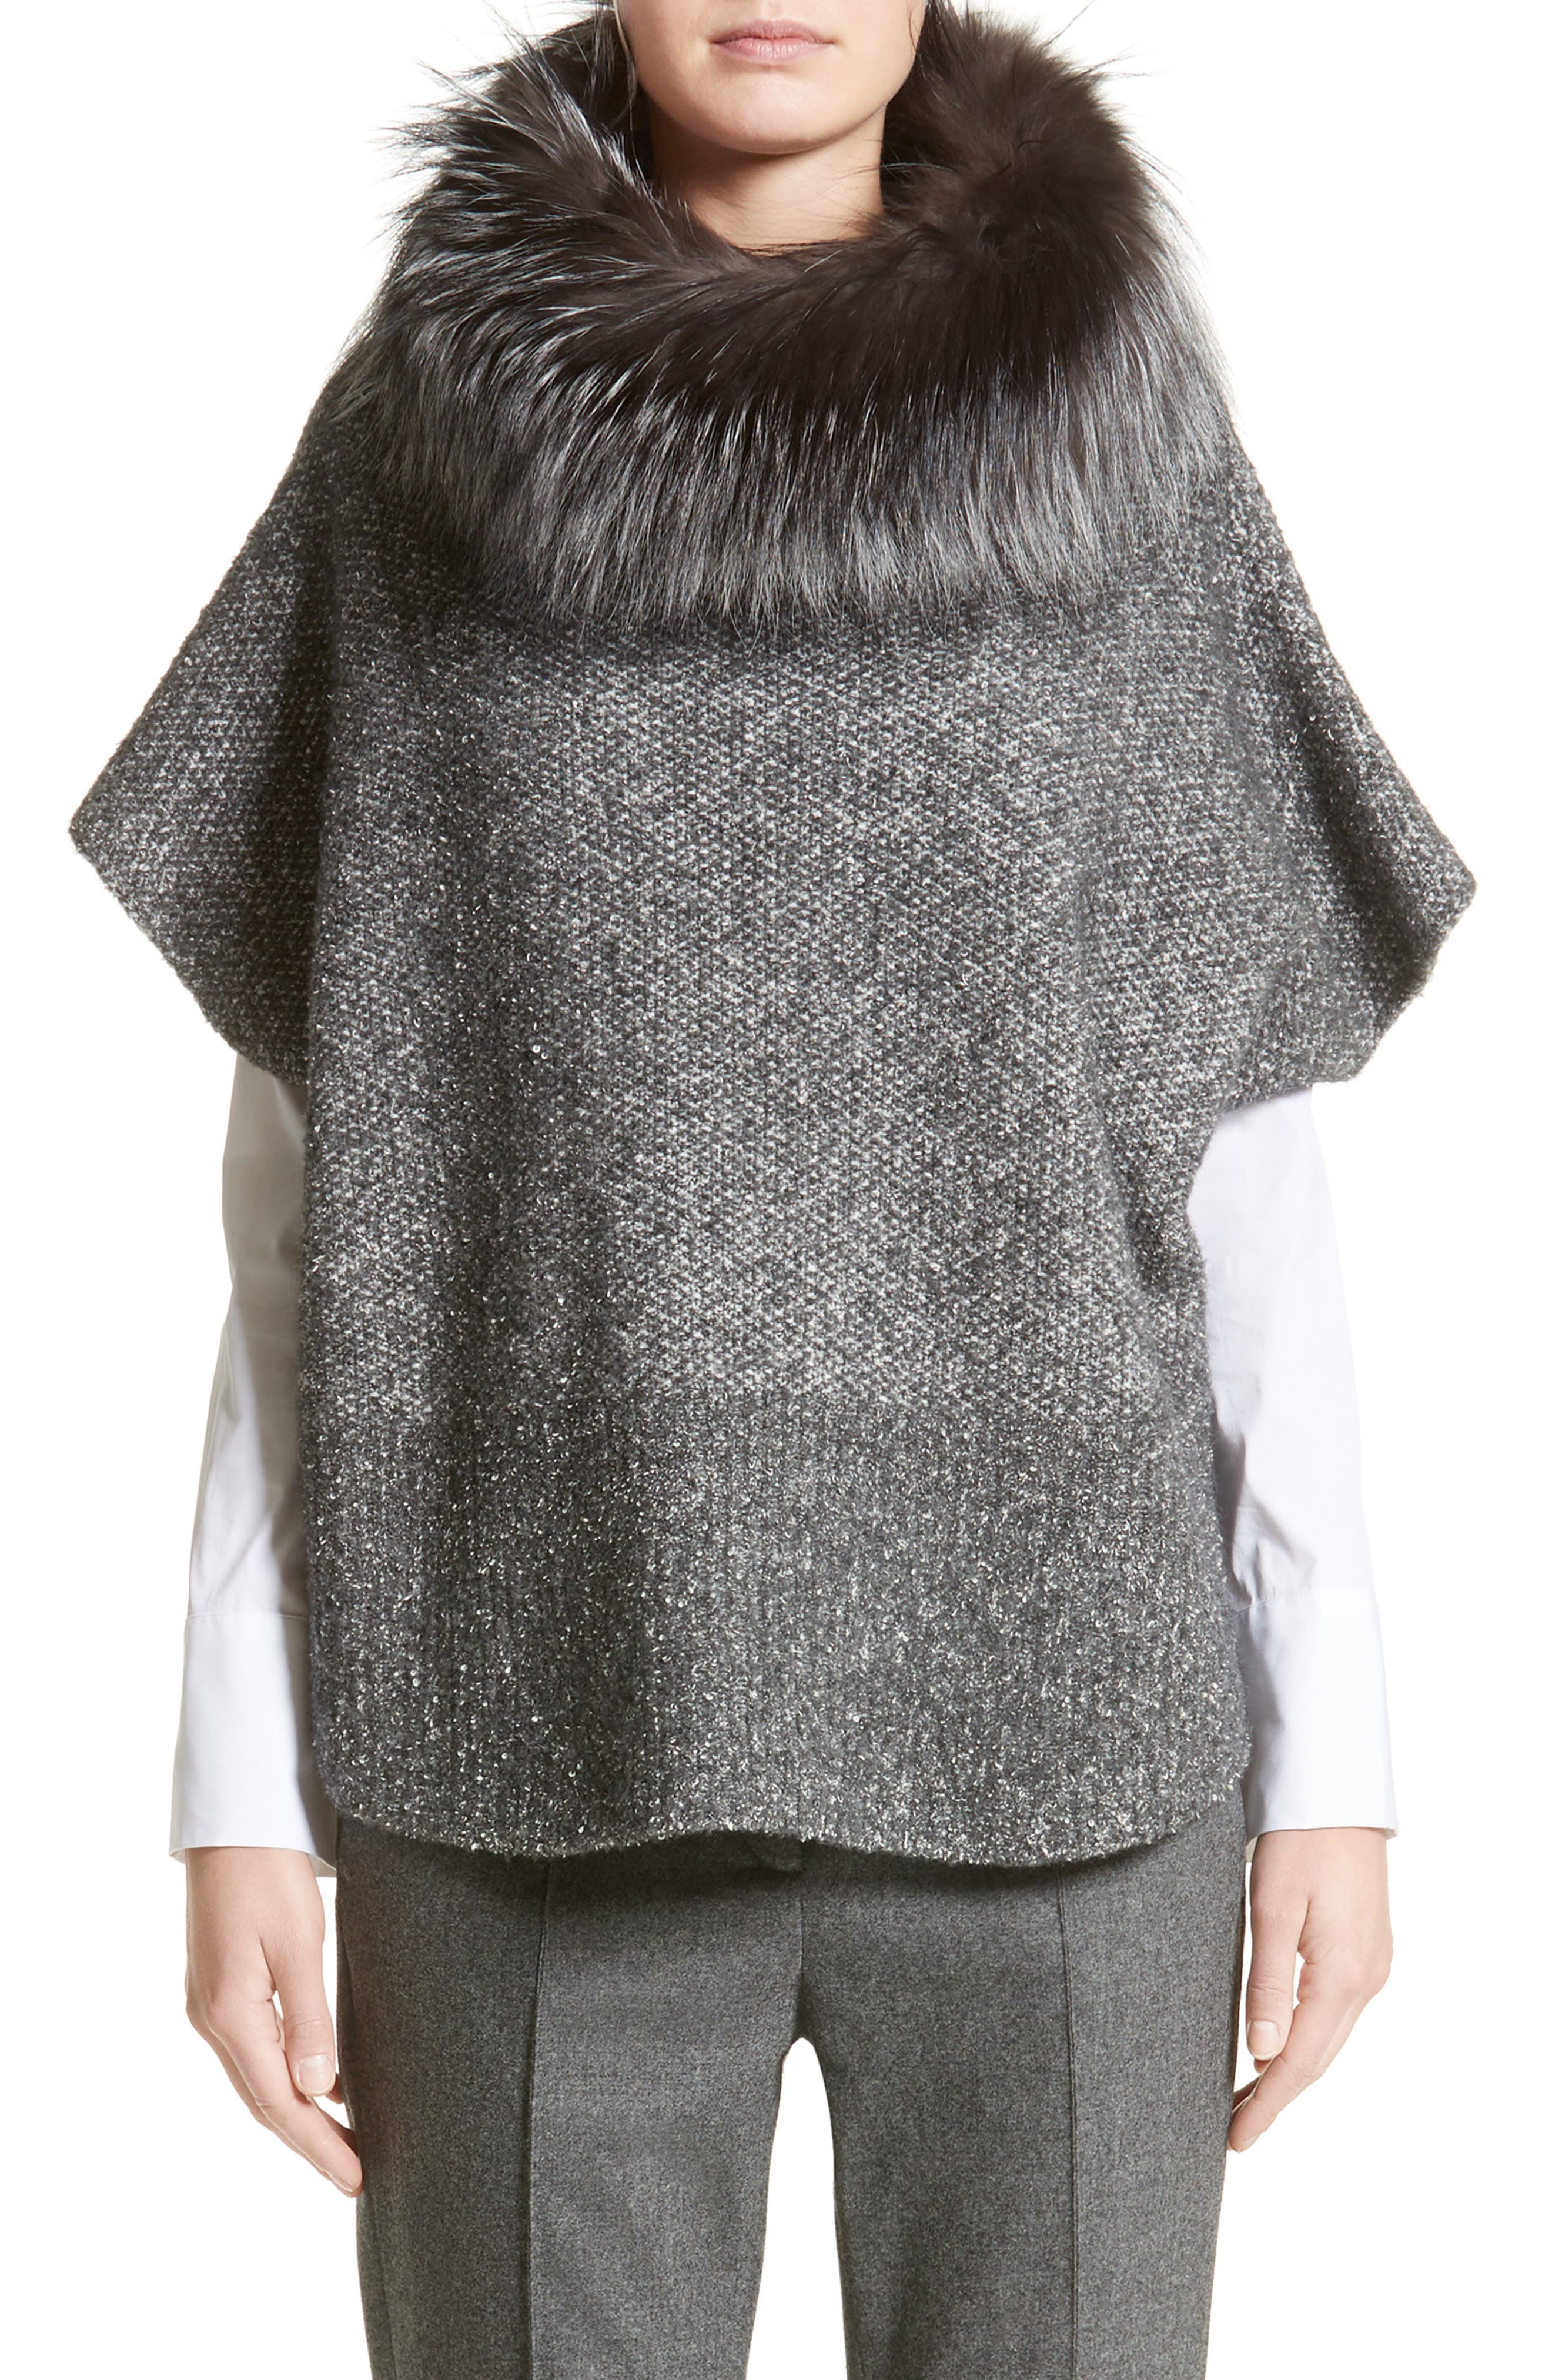 Pebble Tweed Knit Poncho with Genuine Fox Fur Collar,                             Main thumbnail 1, color,                             021